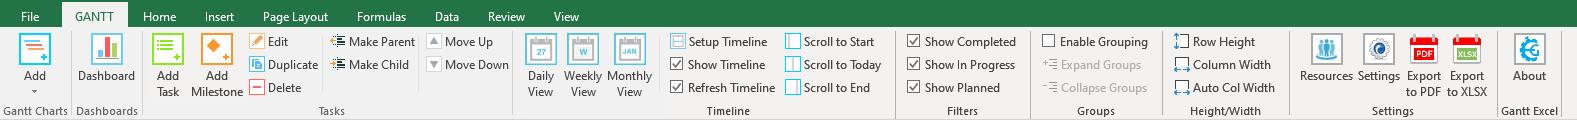 Gantt Excel Ribbon Menu